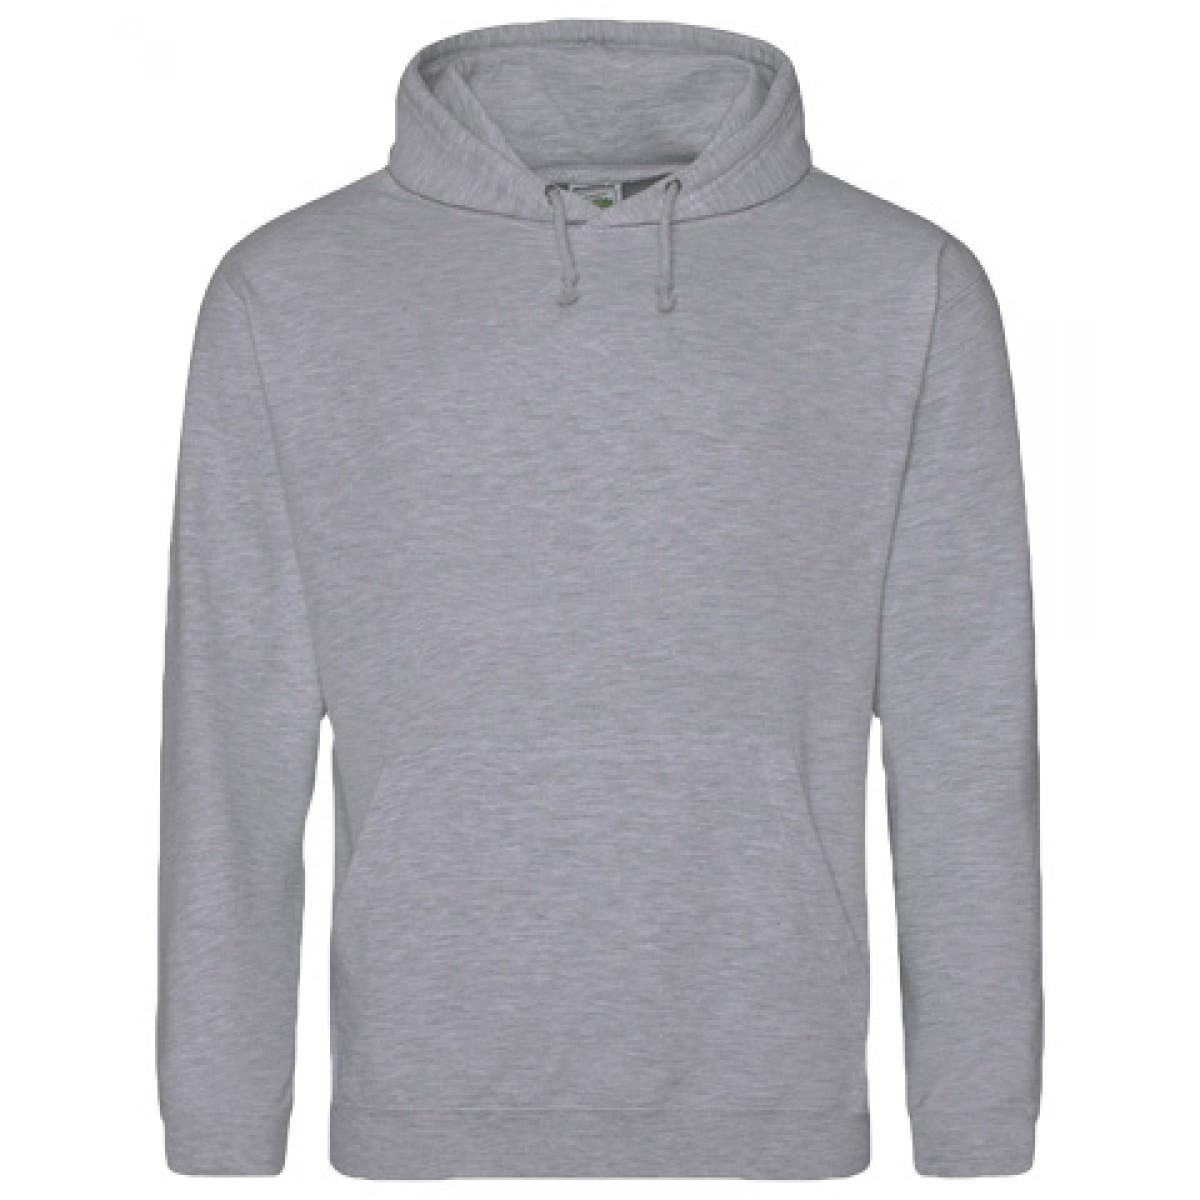 Hooded Sweatshirt 50/50 Heavy Blend-Gray-M